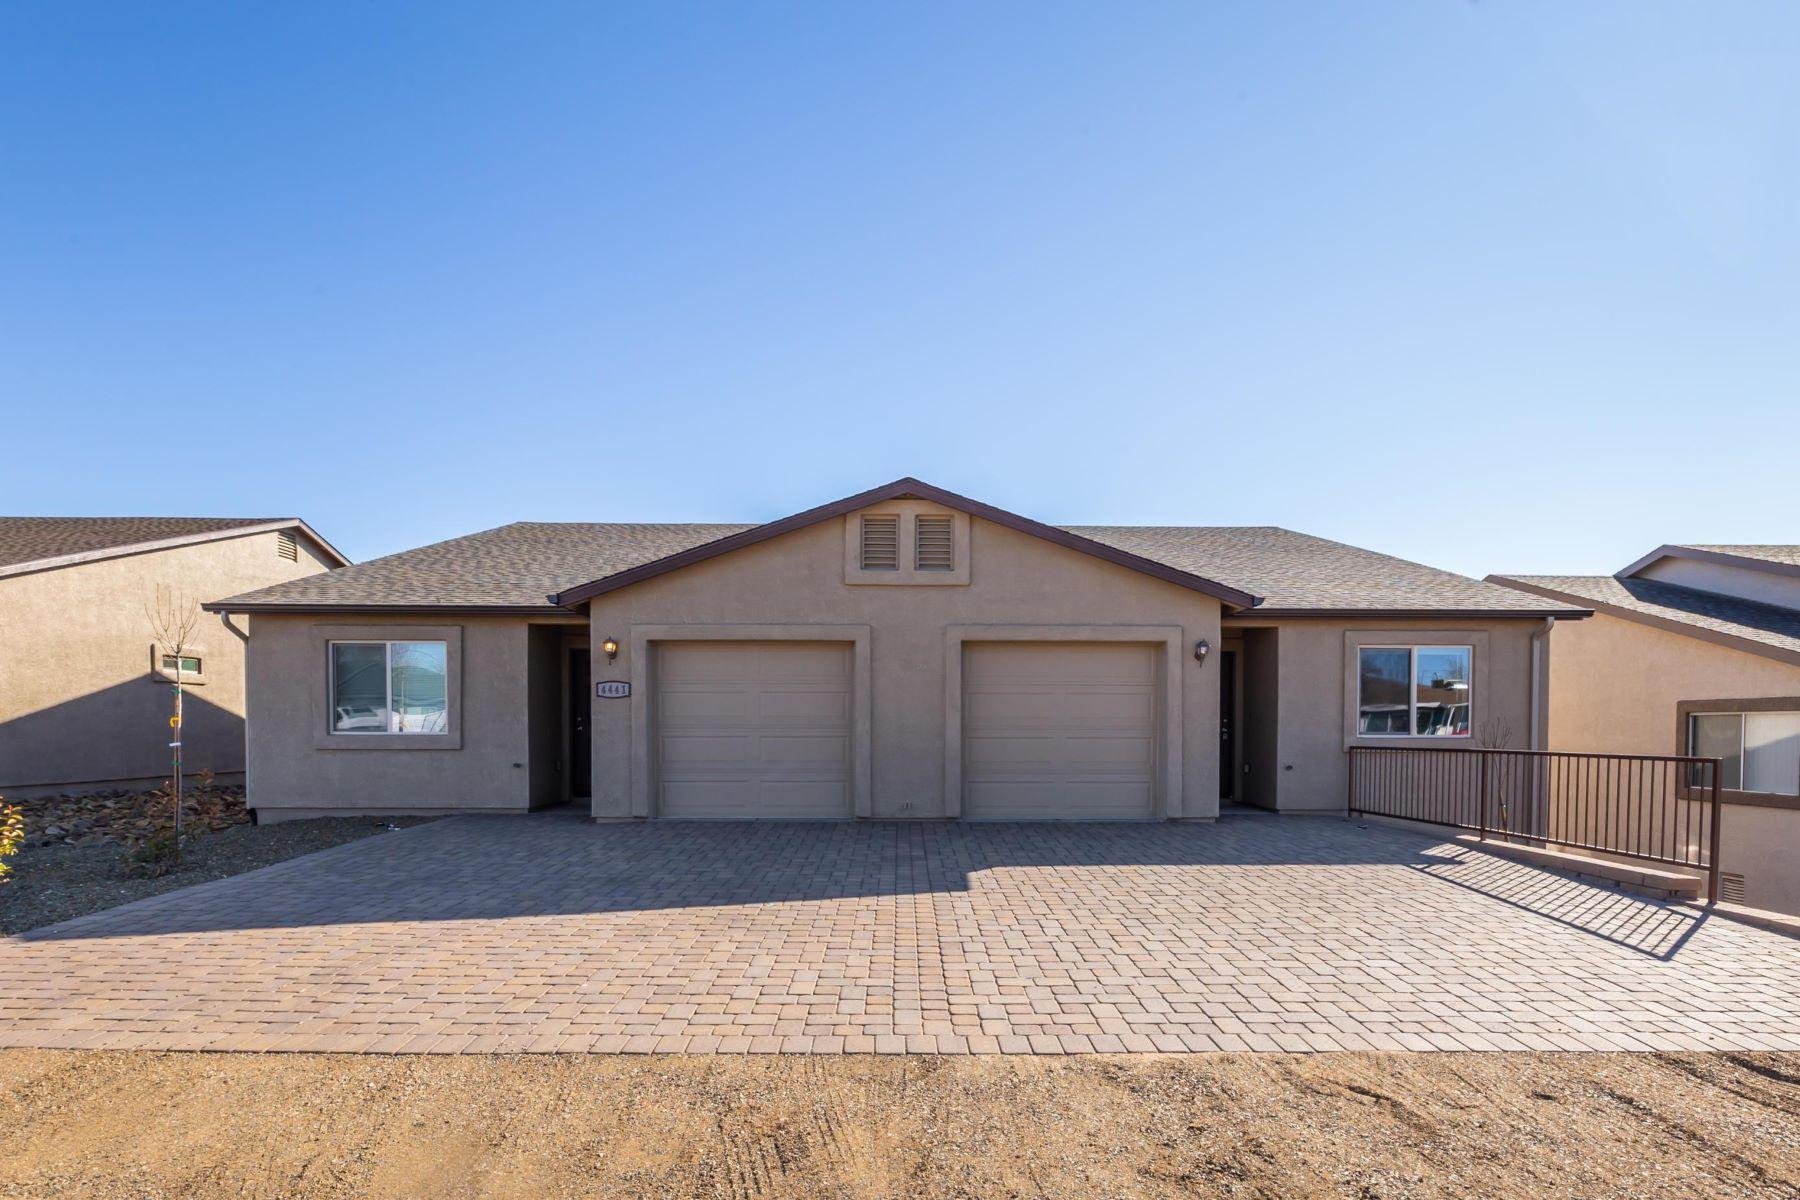 Multi-Family Homes 为 销售 在 Prescott Valley 9201 Spouse Drive 普雷斯科特谷, 亚利桑那州 86314 美国